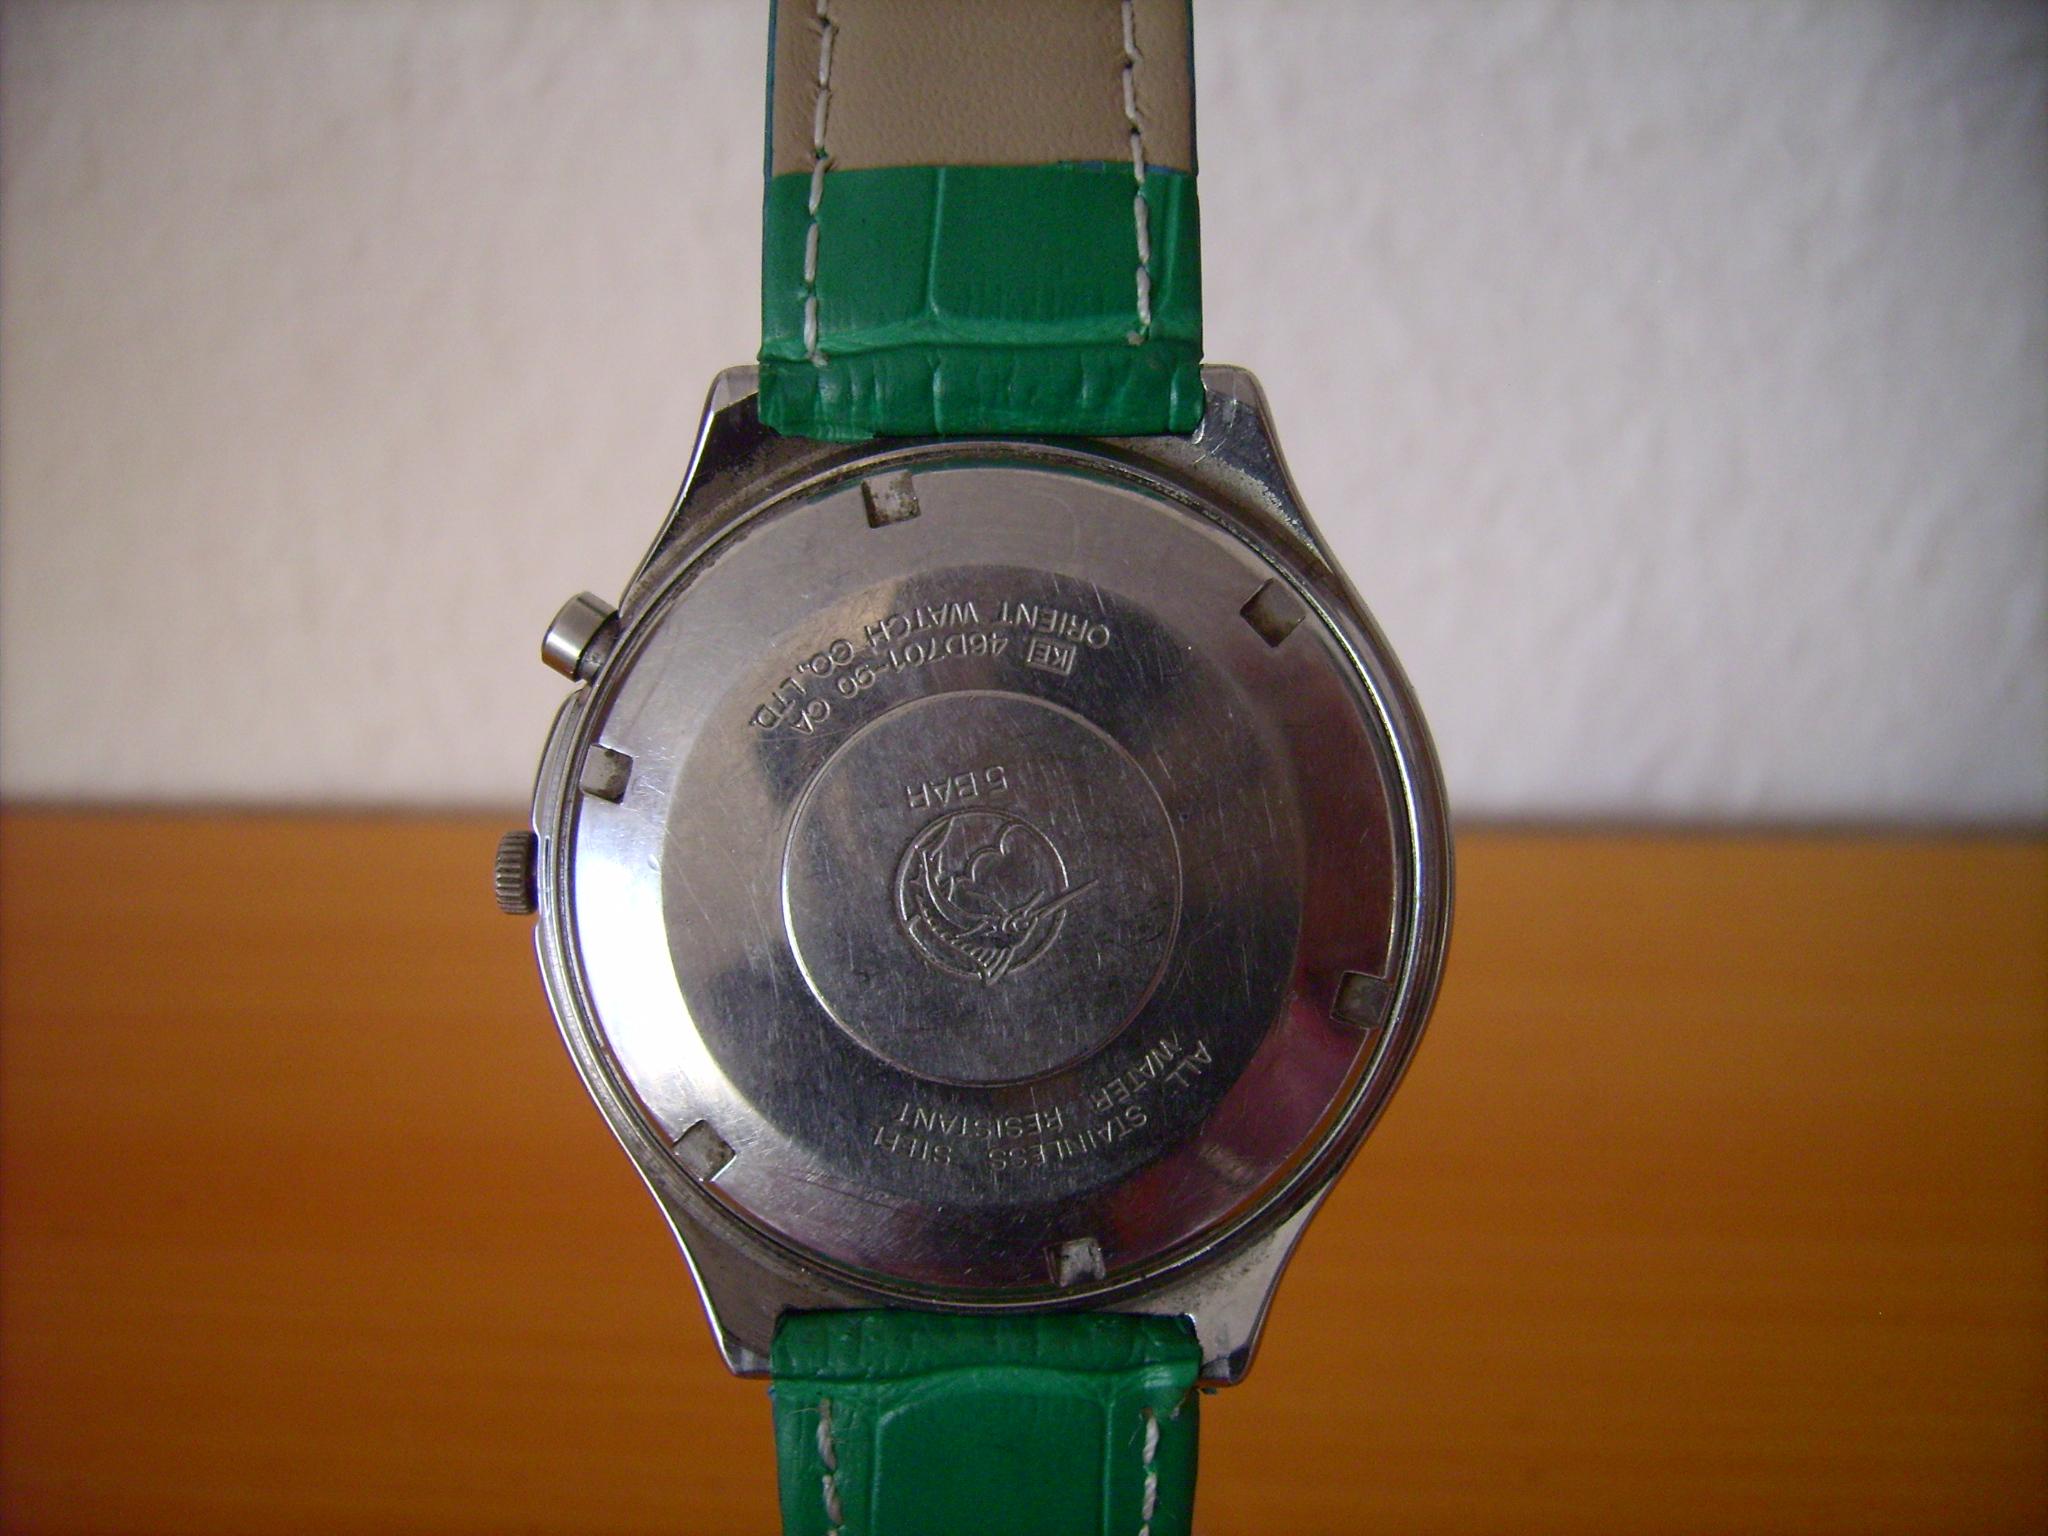 LPIC4963.JPG